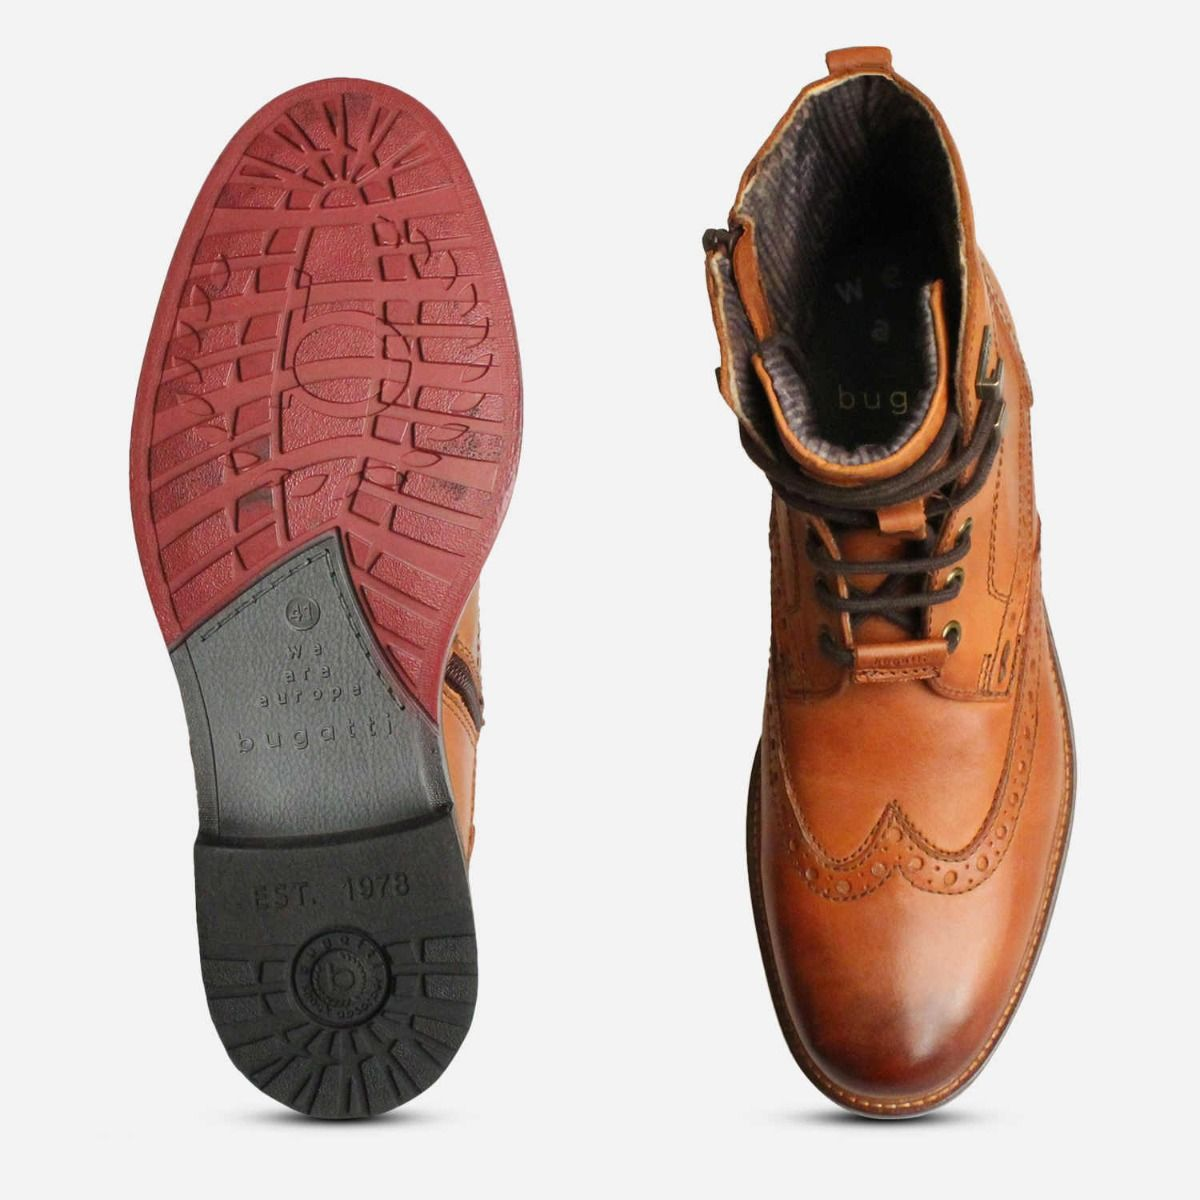 Bugatti Urban Trekking Zip Boot in Light Brown Leather